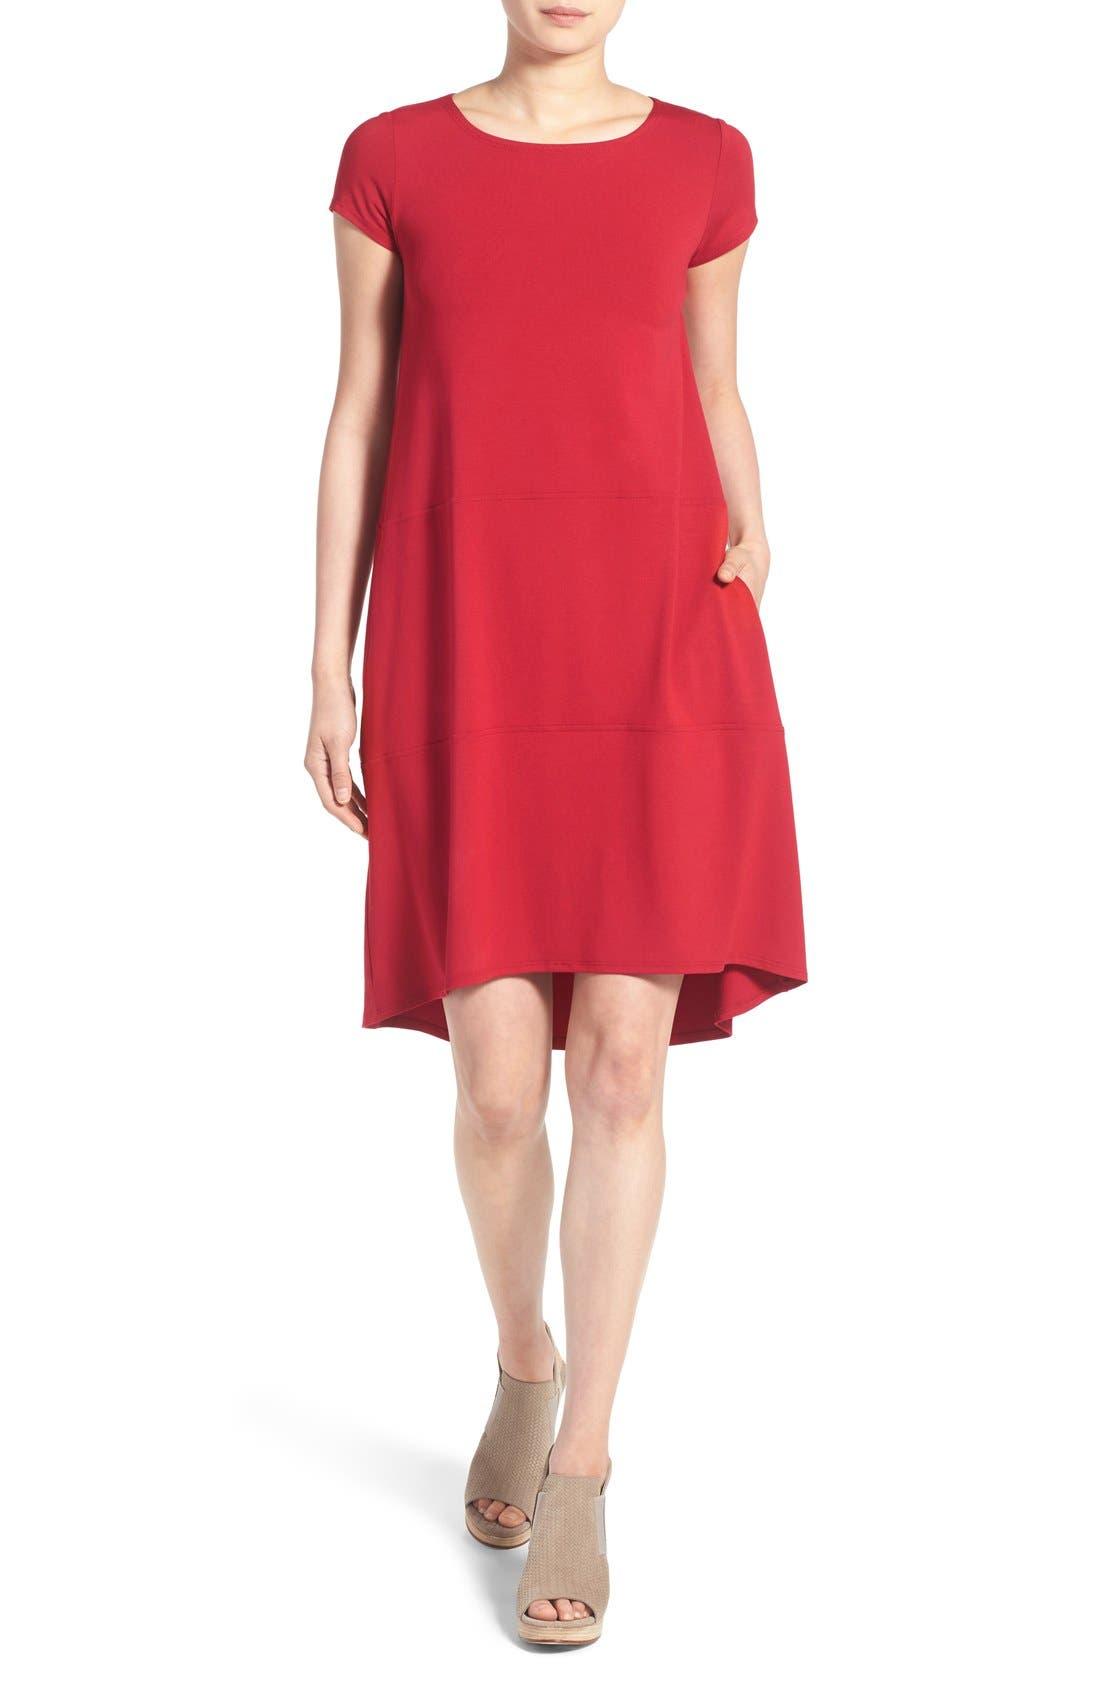 Alternate Image 1 Selected - Eileen Fisher Bateau Neck Cap Sleeve Dress (Regular & Petite)